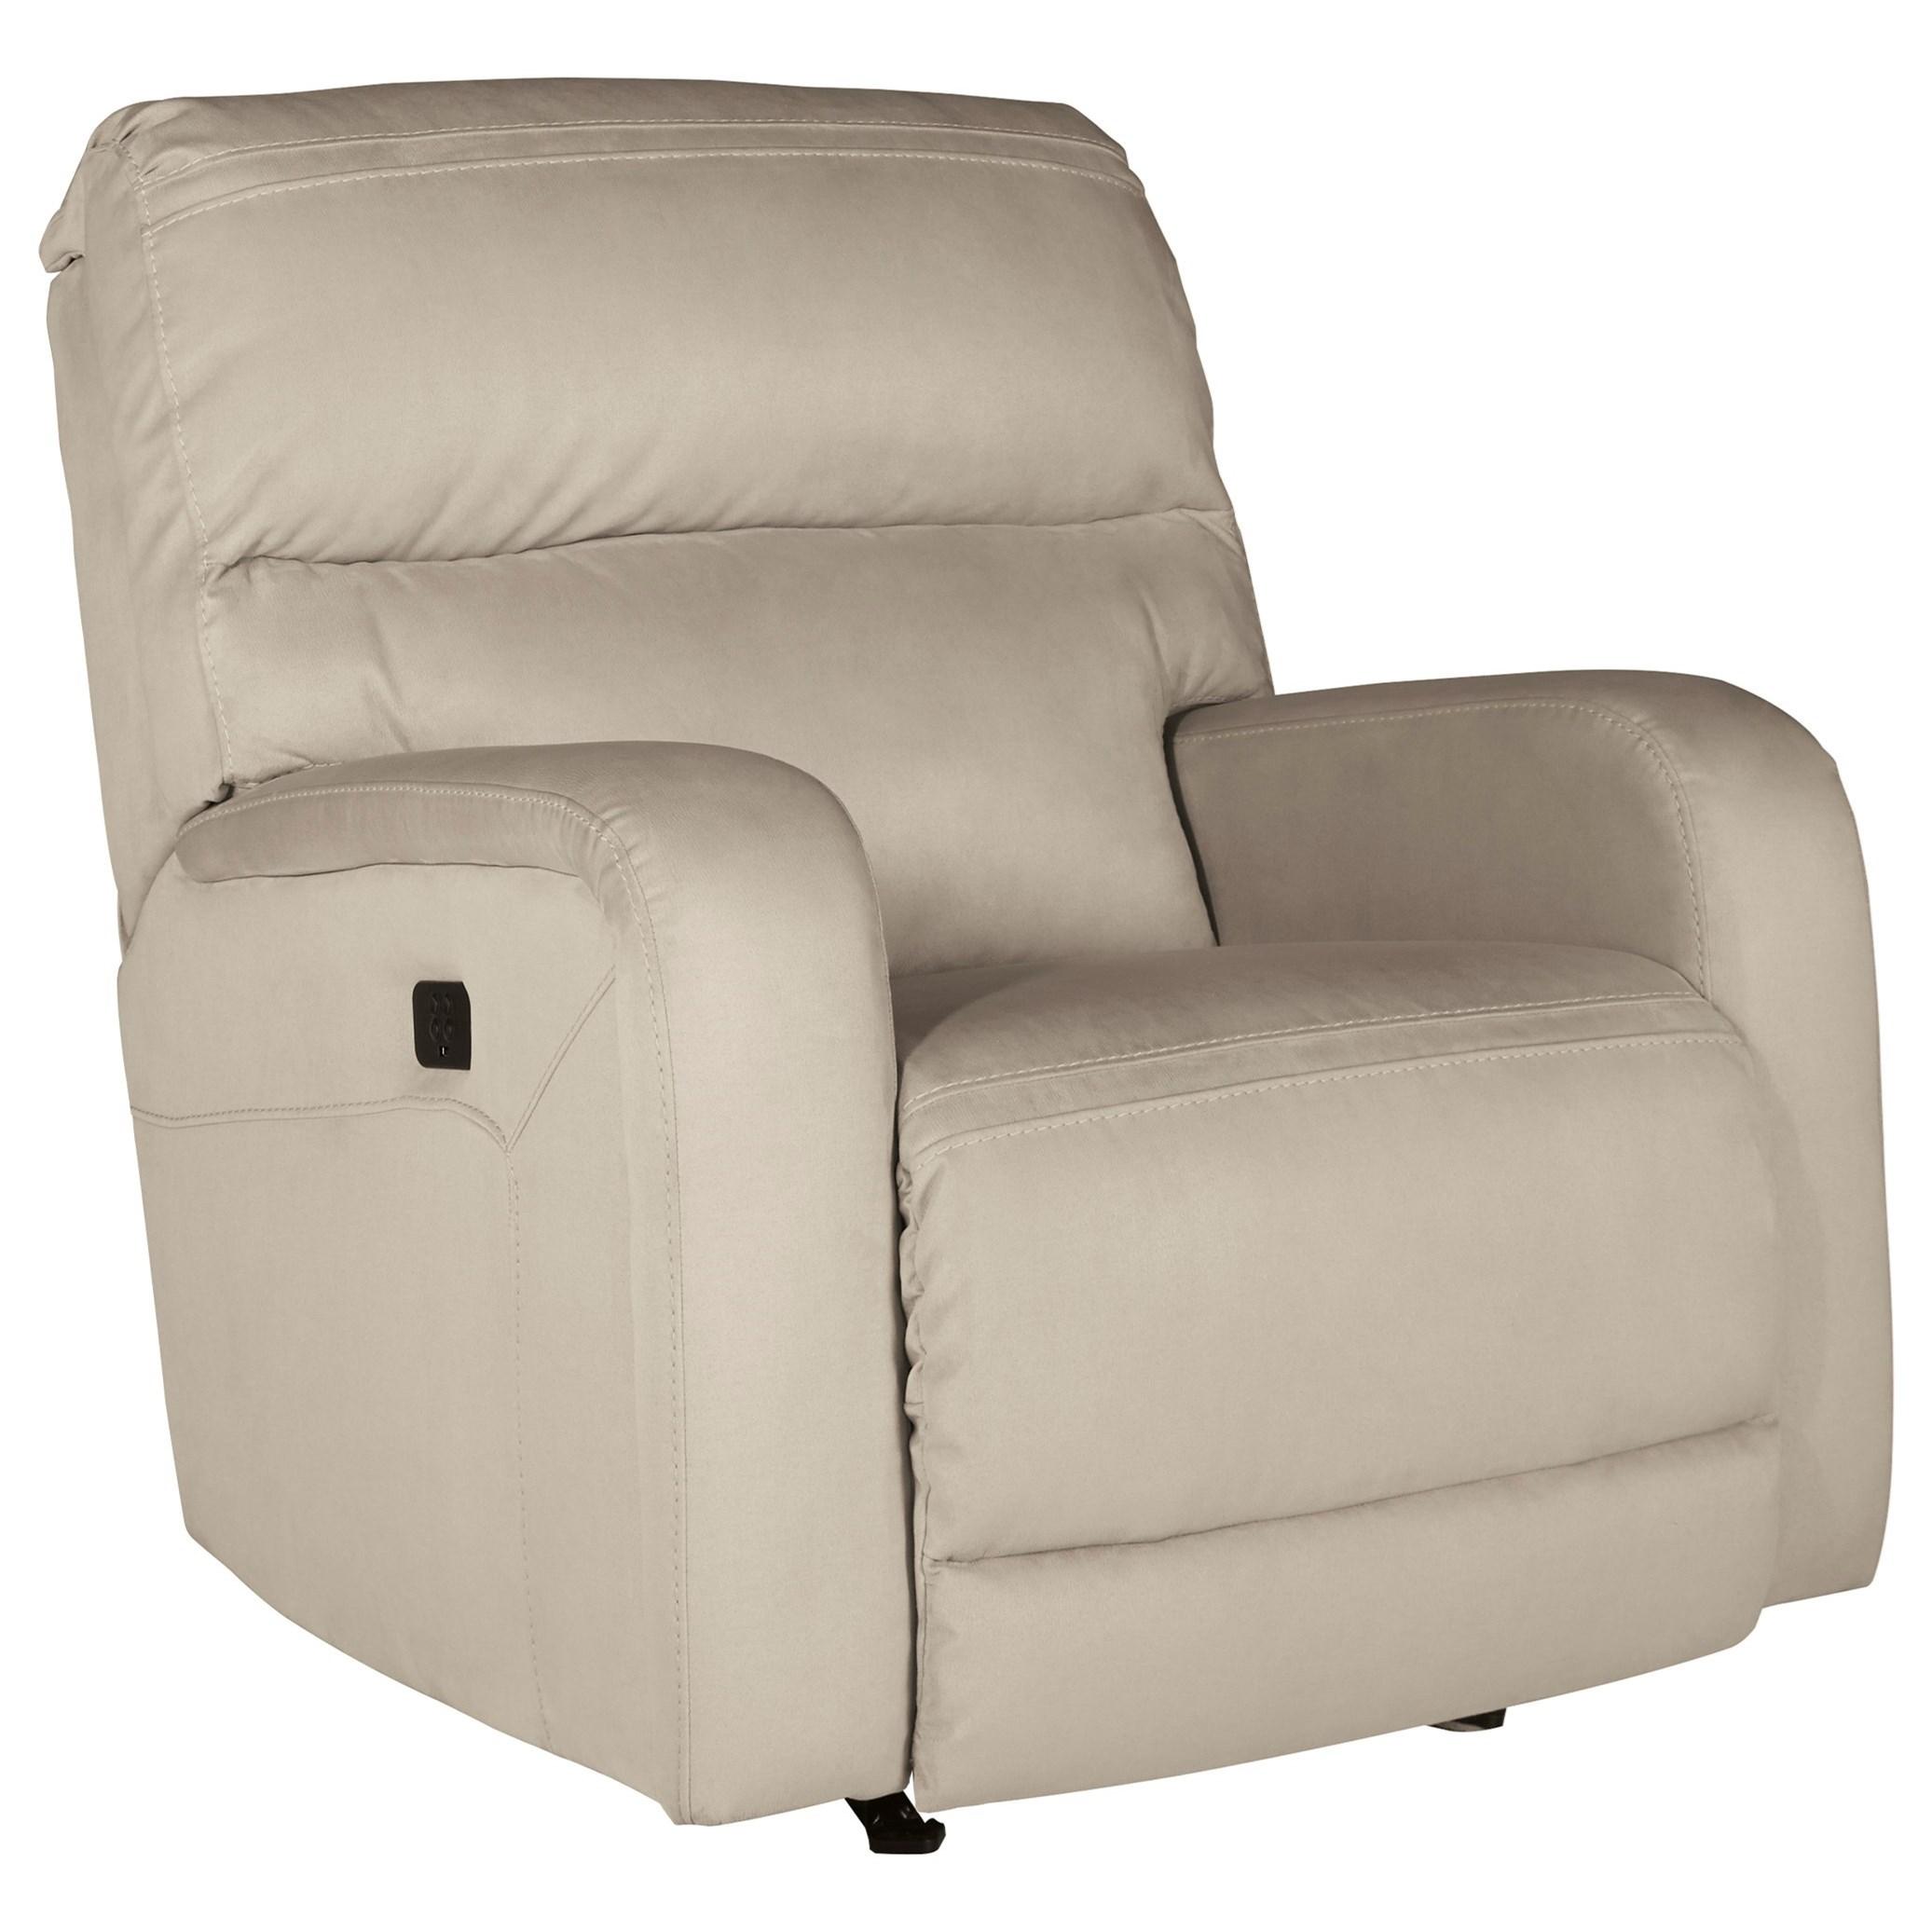 Trendz Alani Power Rocker Recliner w/ Adjustable Headrest - Item Number: 7530413